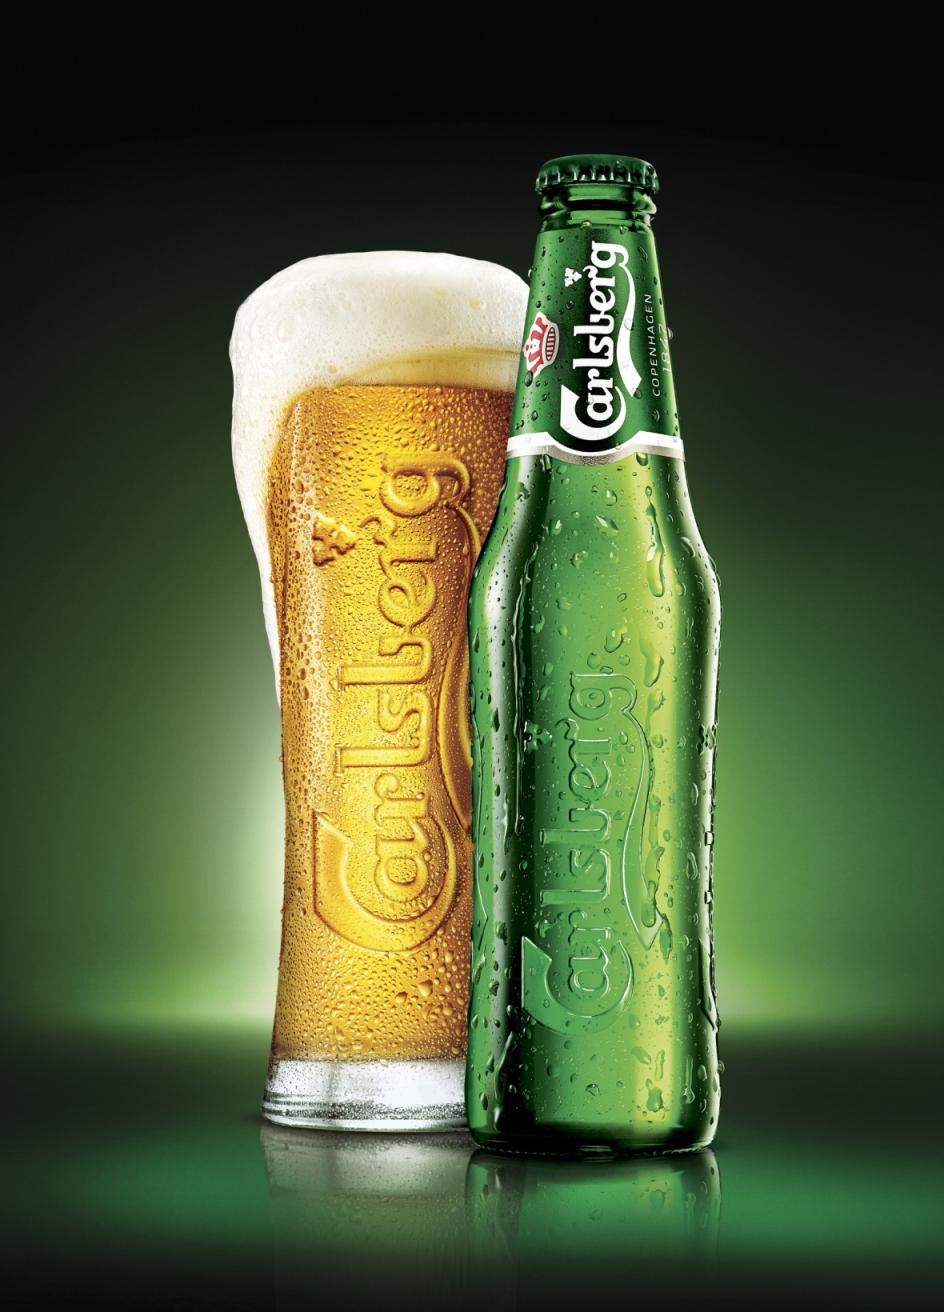 Carlsberg спонсор пуримской вечеринки